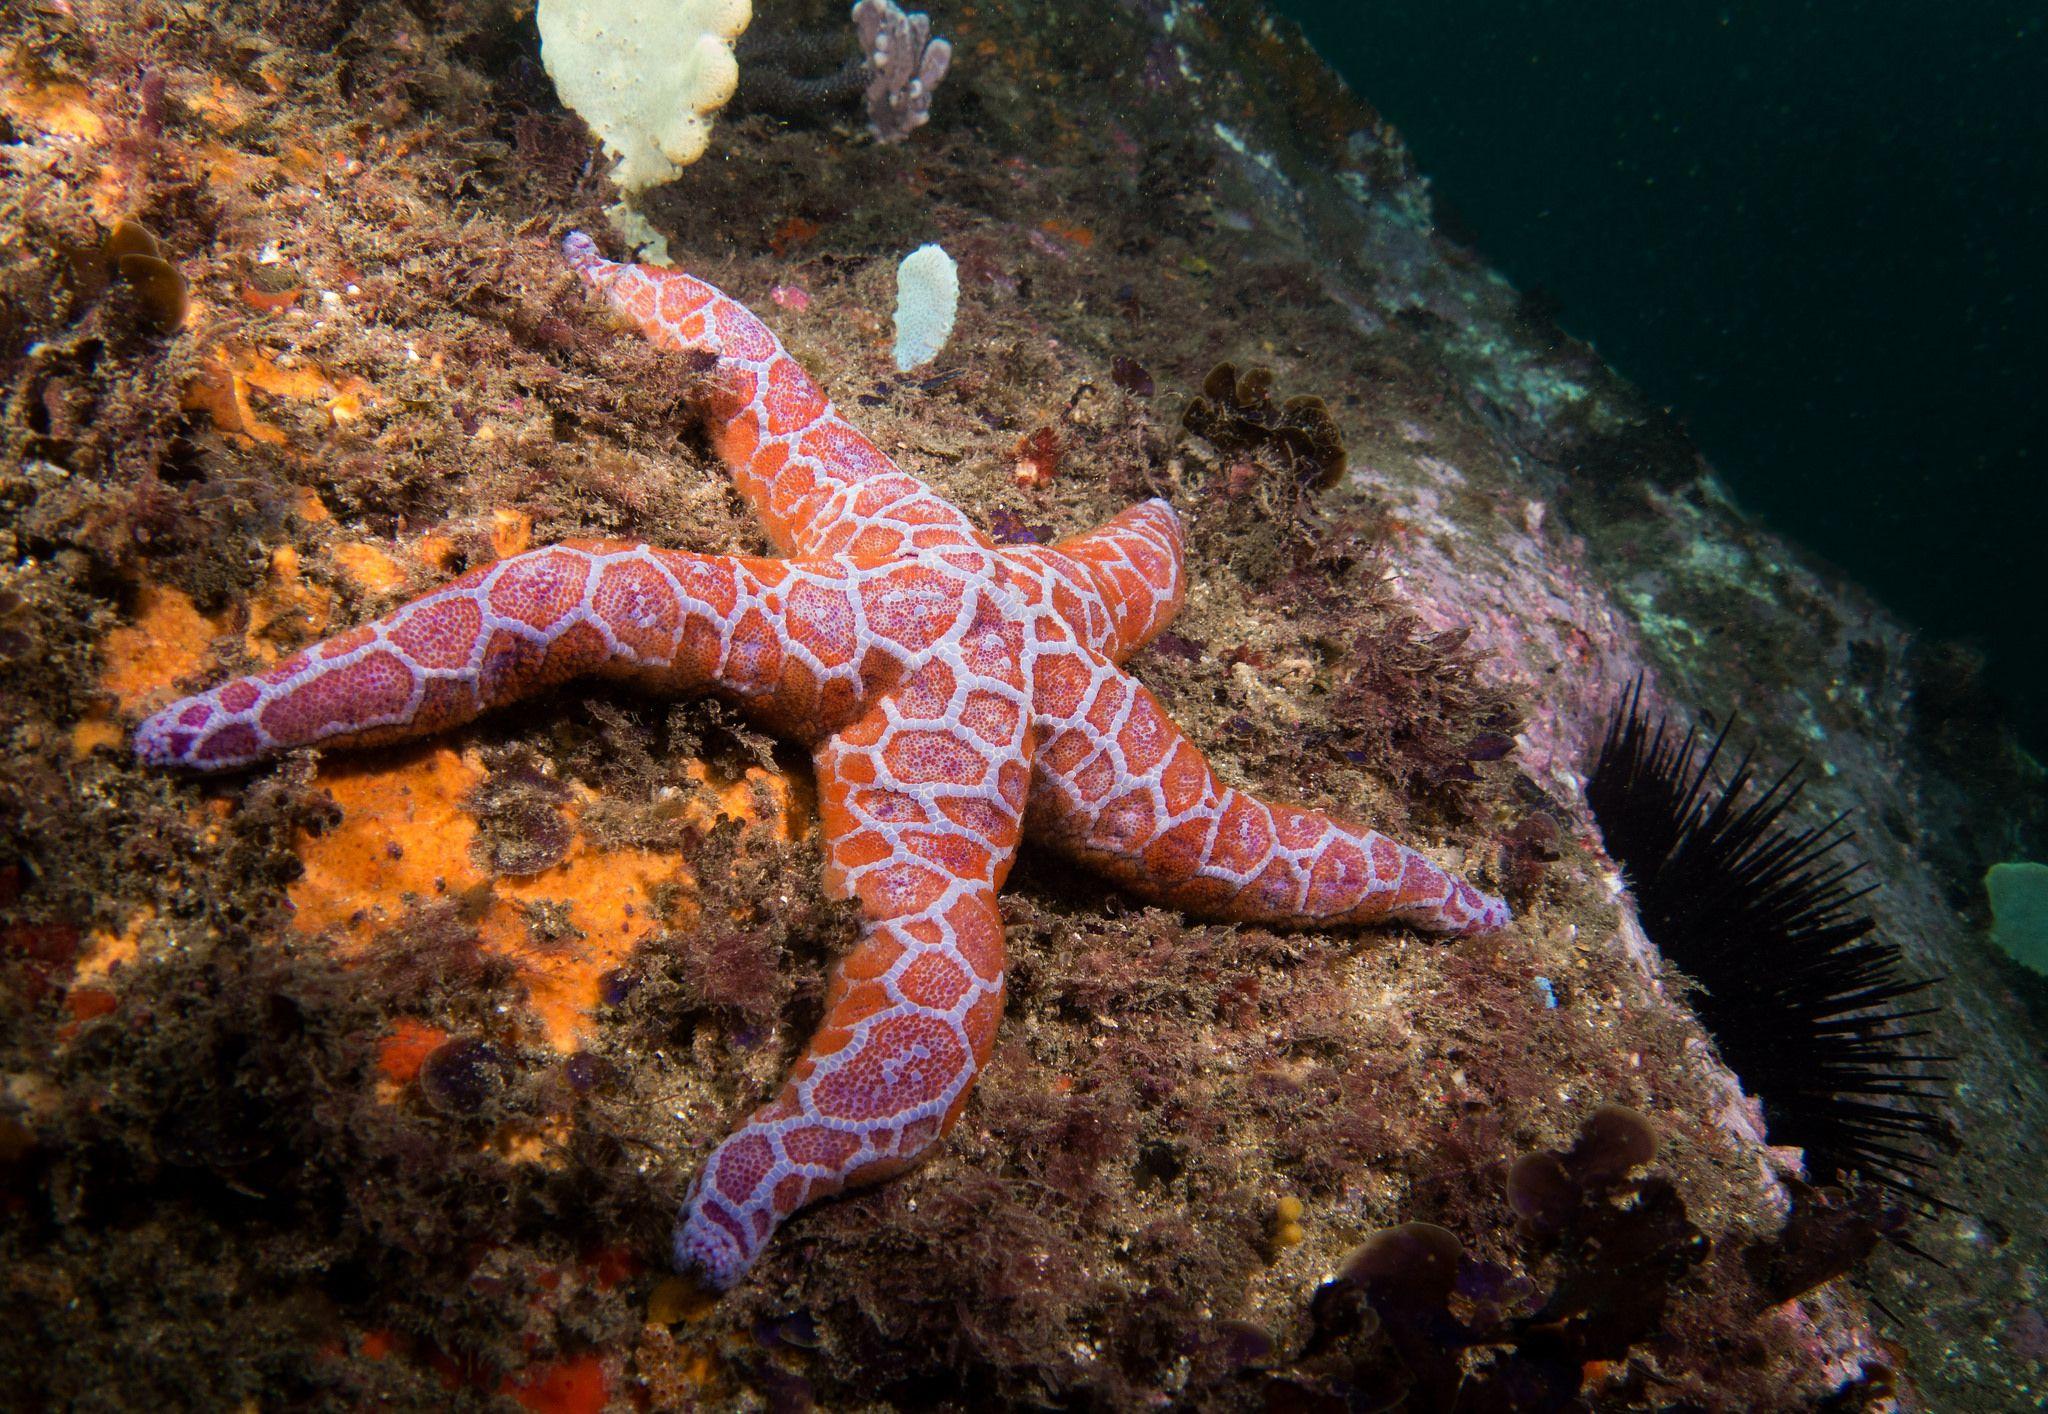 https://flic.kr/p/TK8PrC   Laid back - Mosaic seastar - Plectaster decanus #marineexplorer   Henry Head